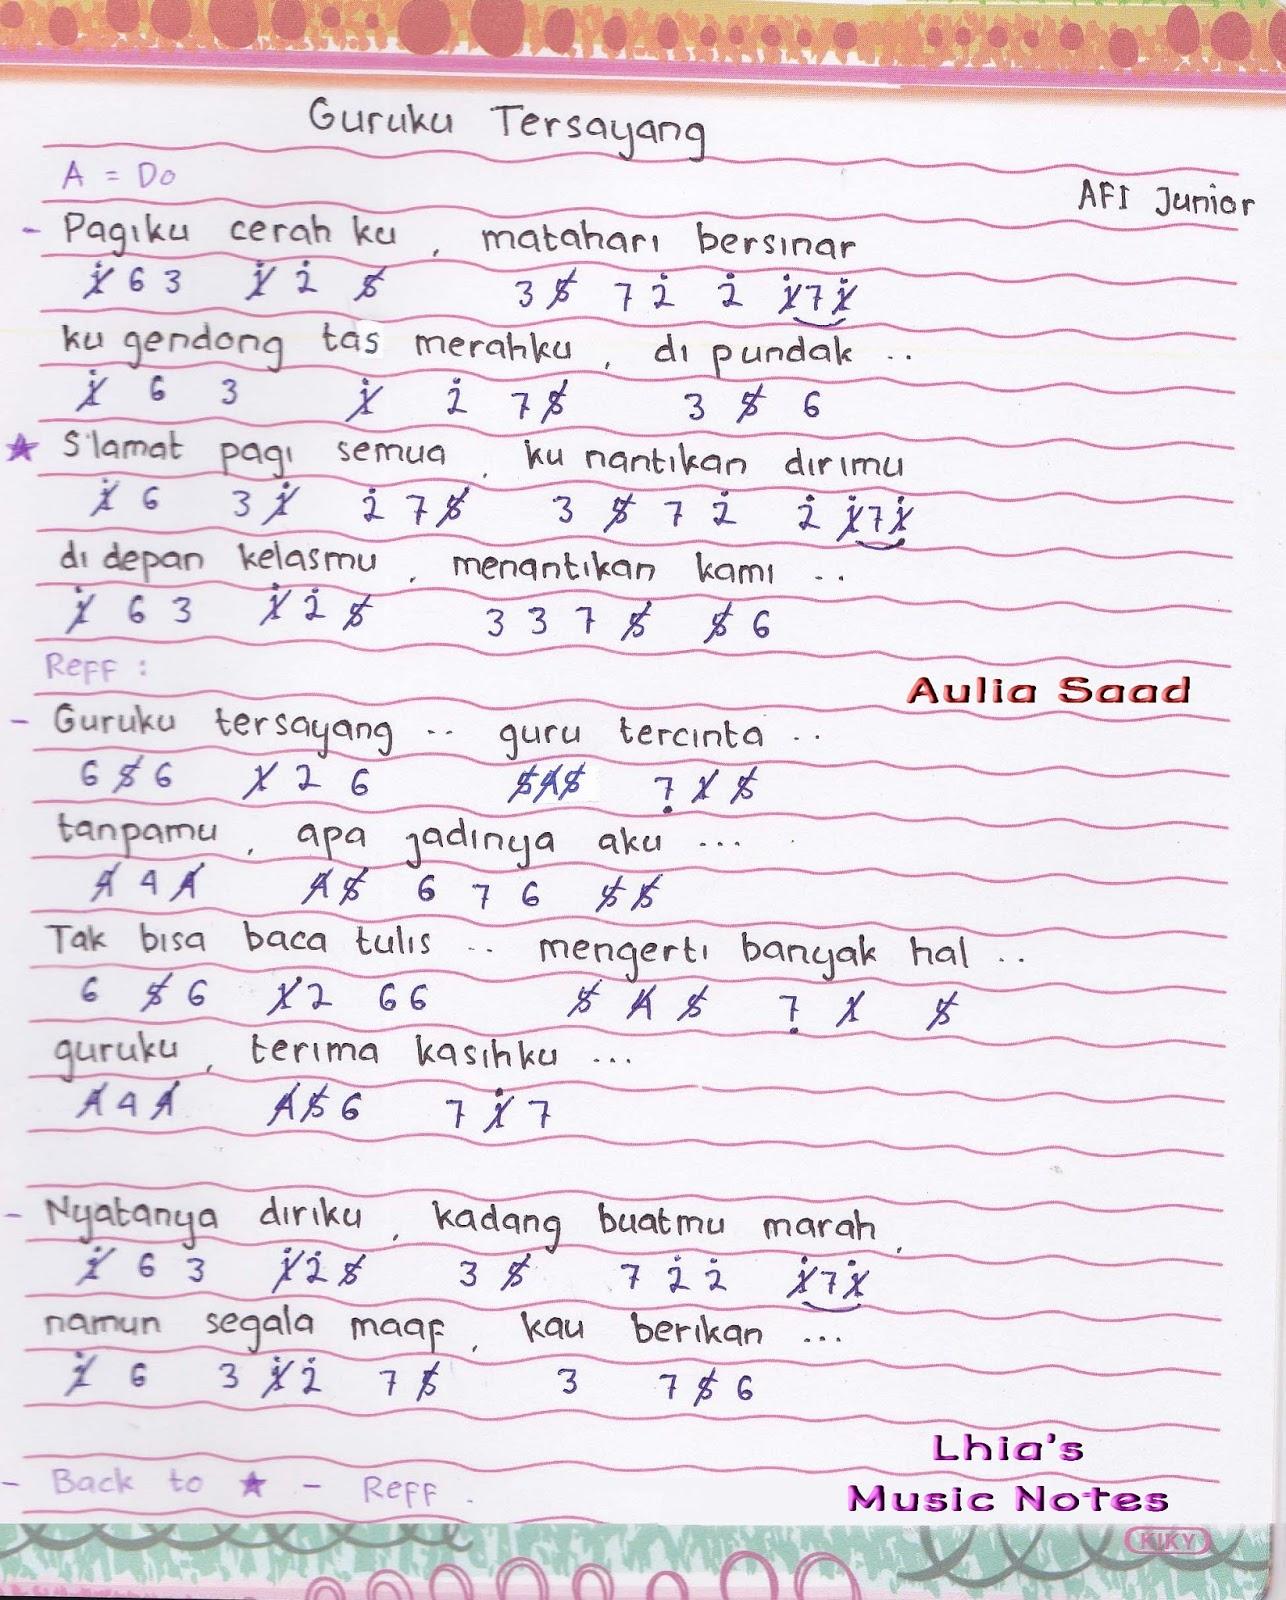 Guruku Tersayang Mp3 : guruku, tersayang, Guruku, Tersayang, Download, Python